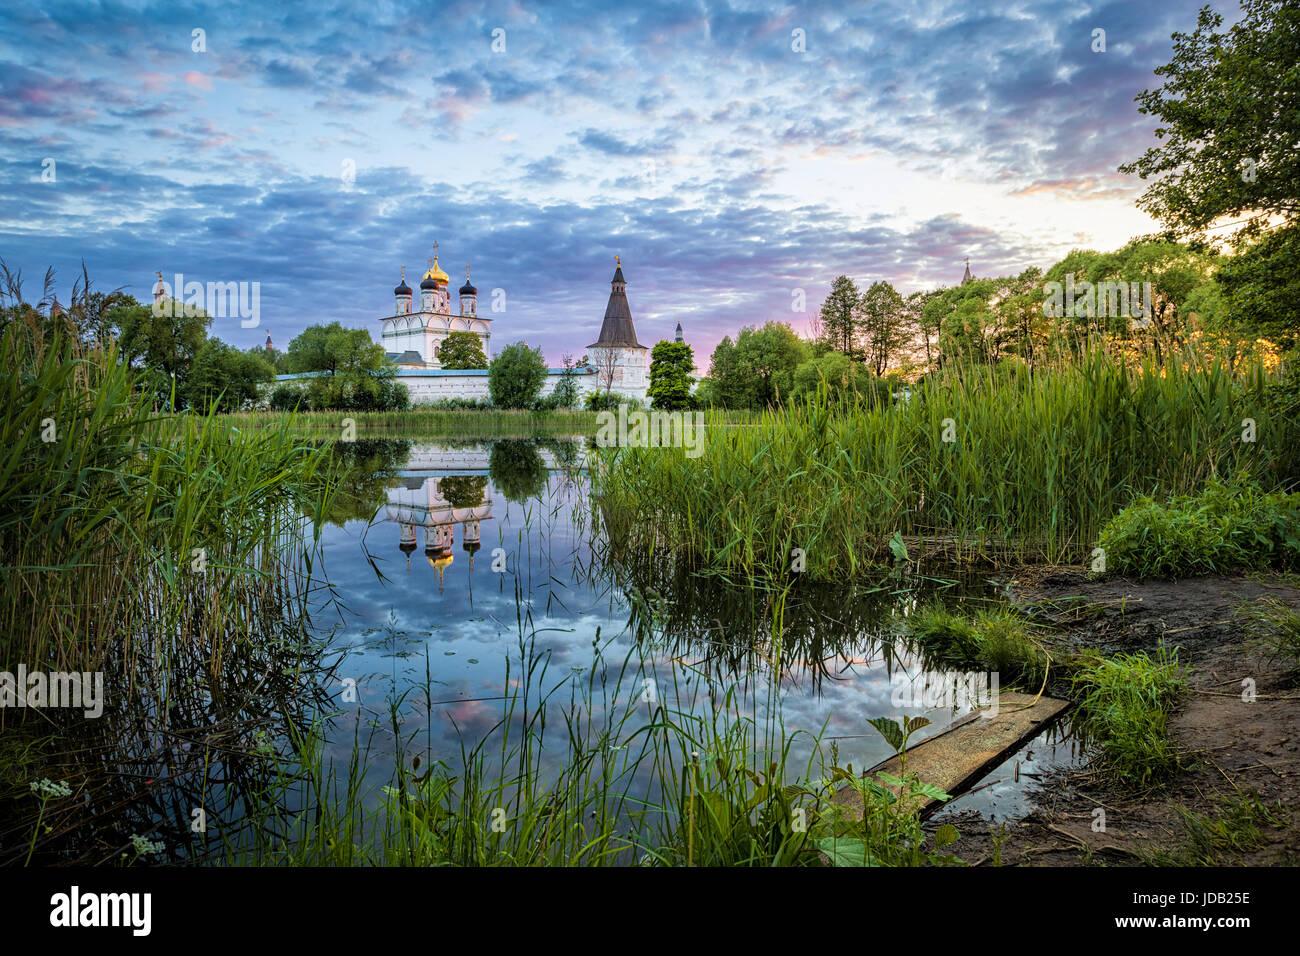 Joseph-Wolokolamsk Kloster im Teich reflektieren, Sonnenuntergang, Oblast Moskau, Russland Stockbild